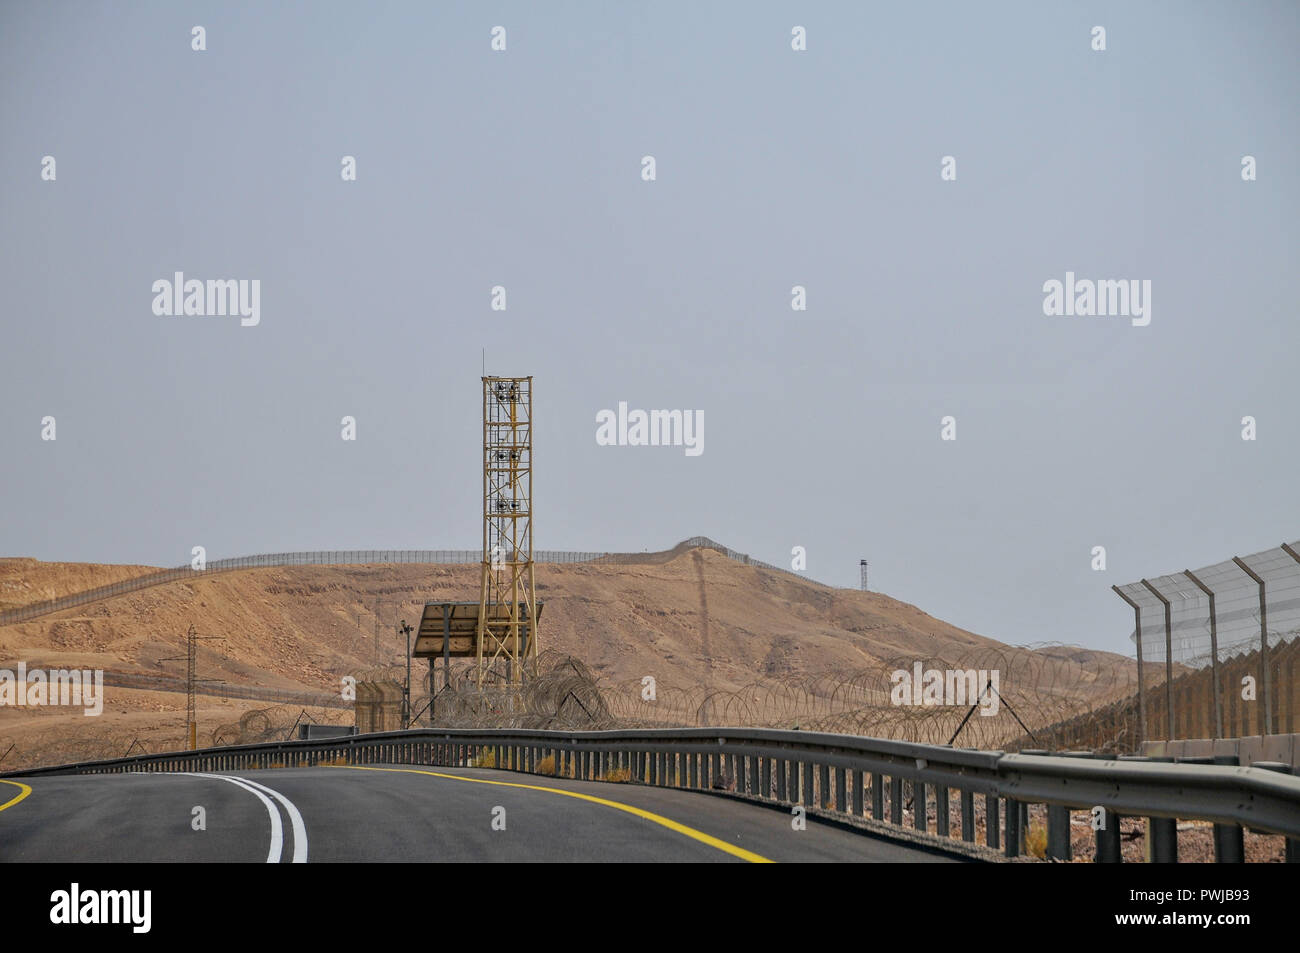 The fence of the Israeli, Egyptian border - Stock Image